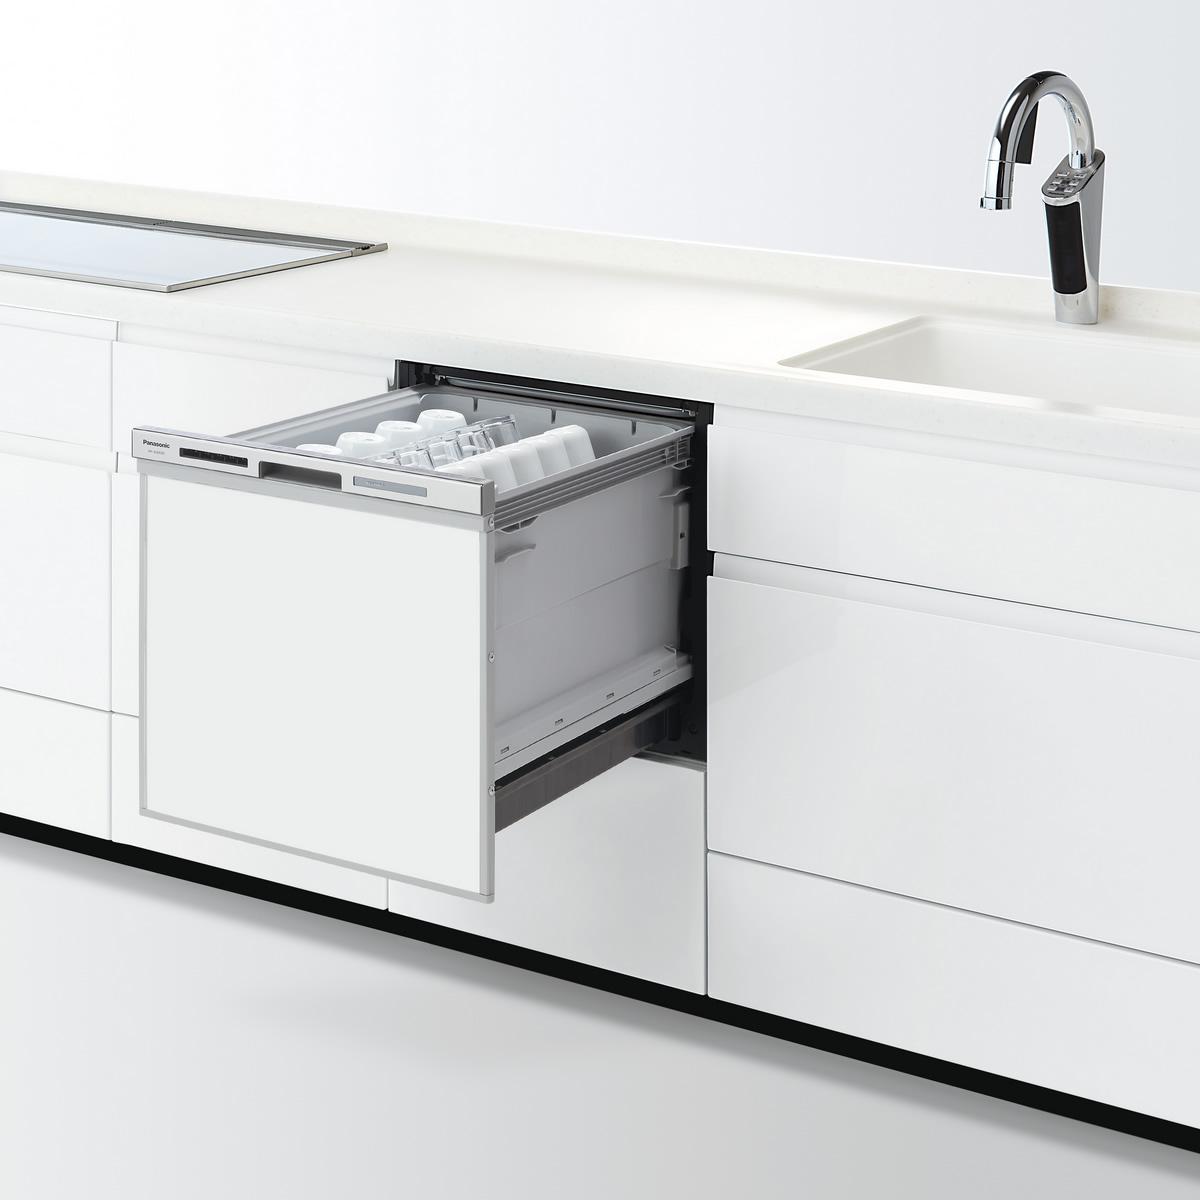 【NP-45MS8S】 パナソニック ビルトイン食器洗い乾燥機(食洗機) M8シリーズ 幅45cm ミドルタイプ ドアパネル型